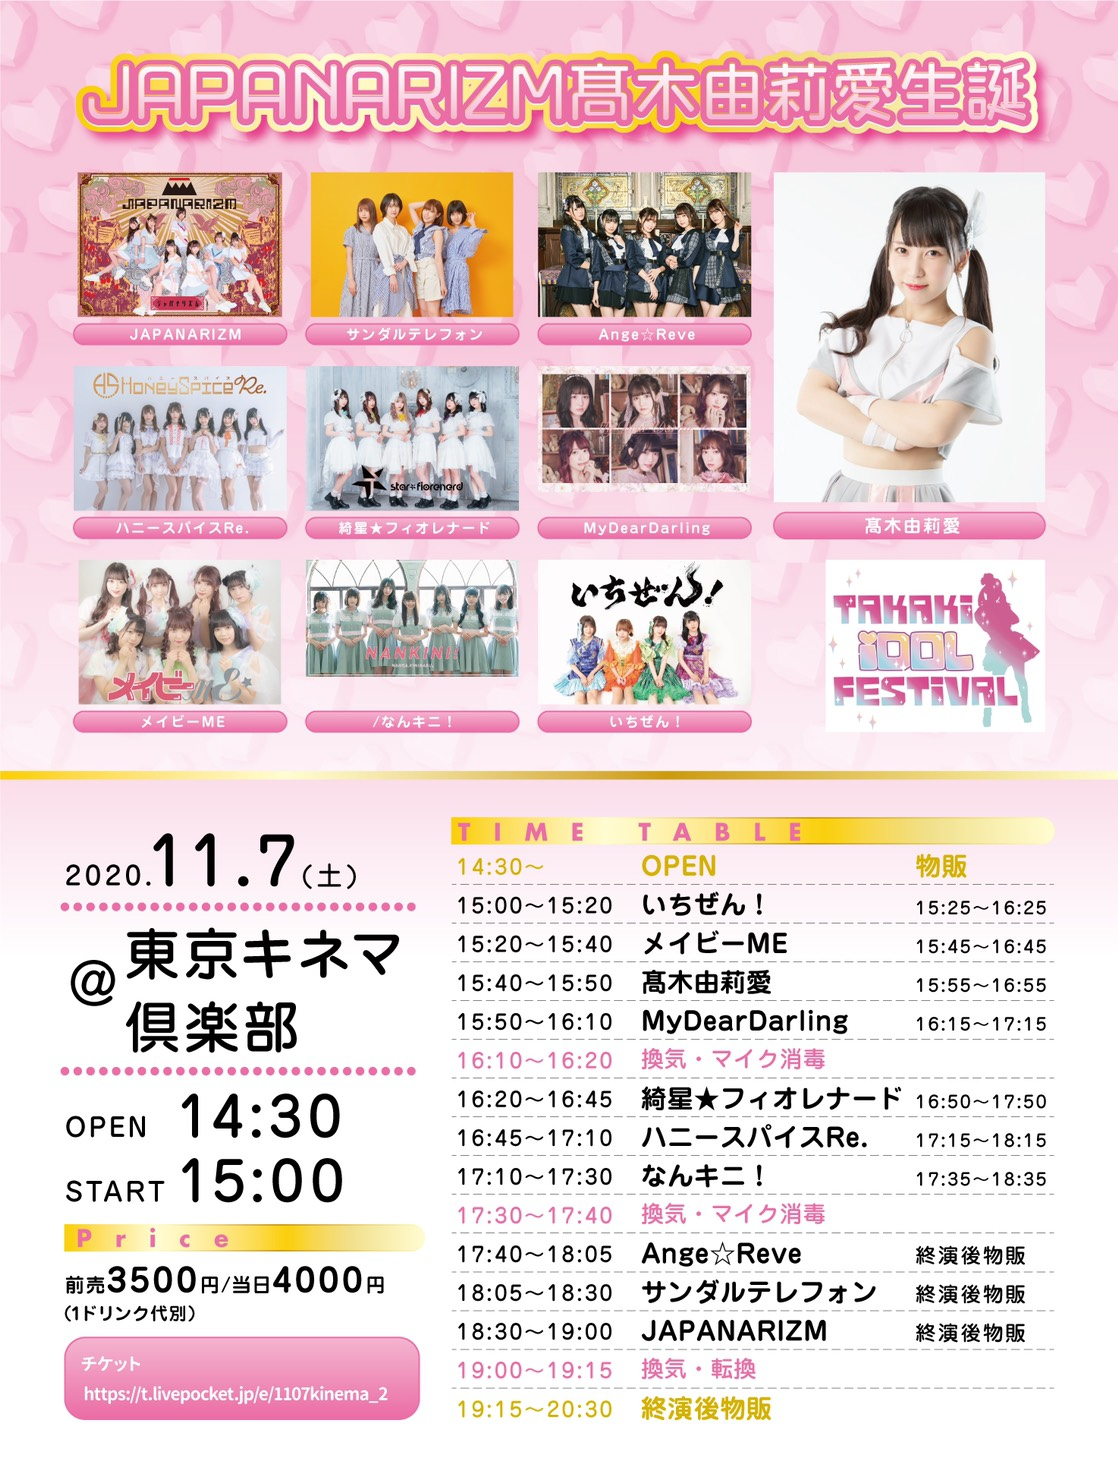 2020/11/7(土) 『JAPANARIZM髙木由莉愛生誕』東京キネマ倶楽部